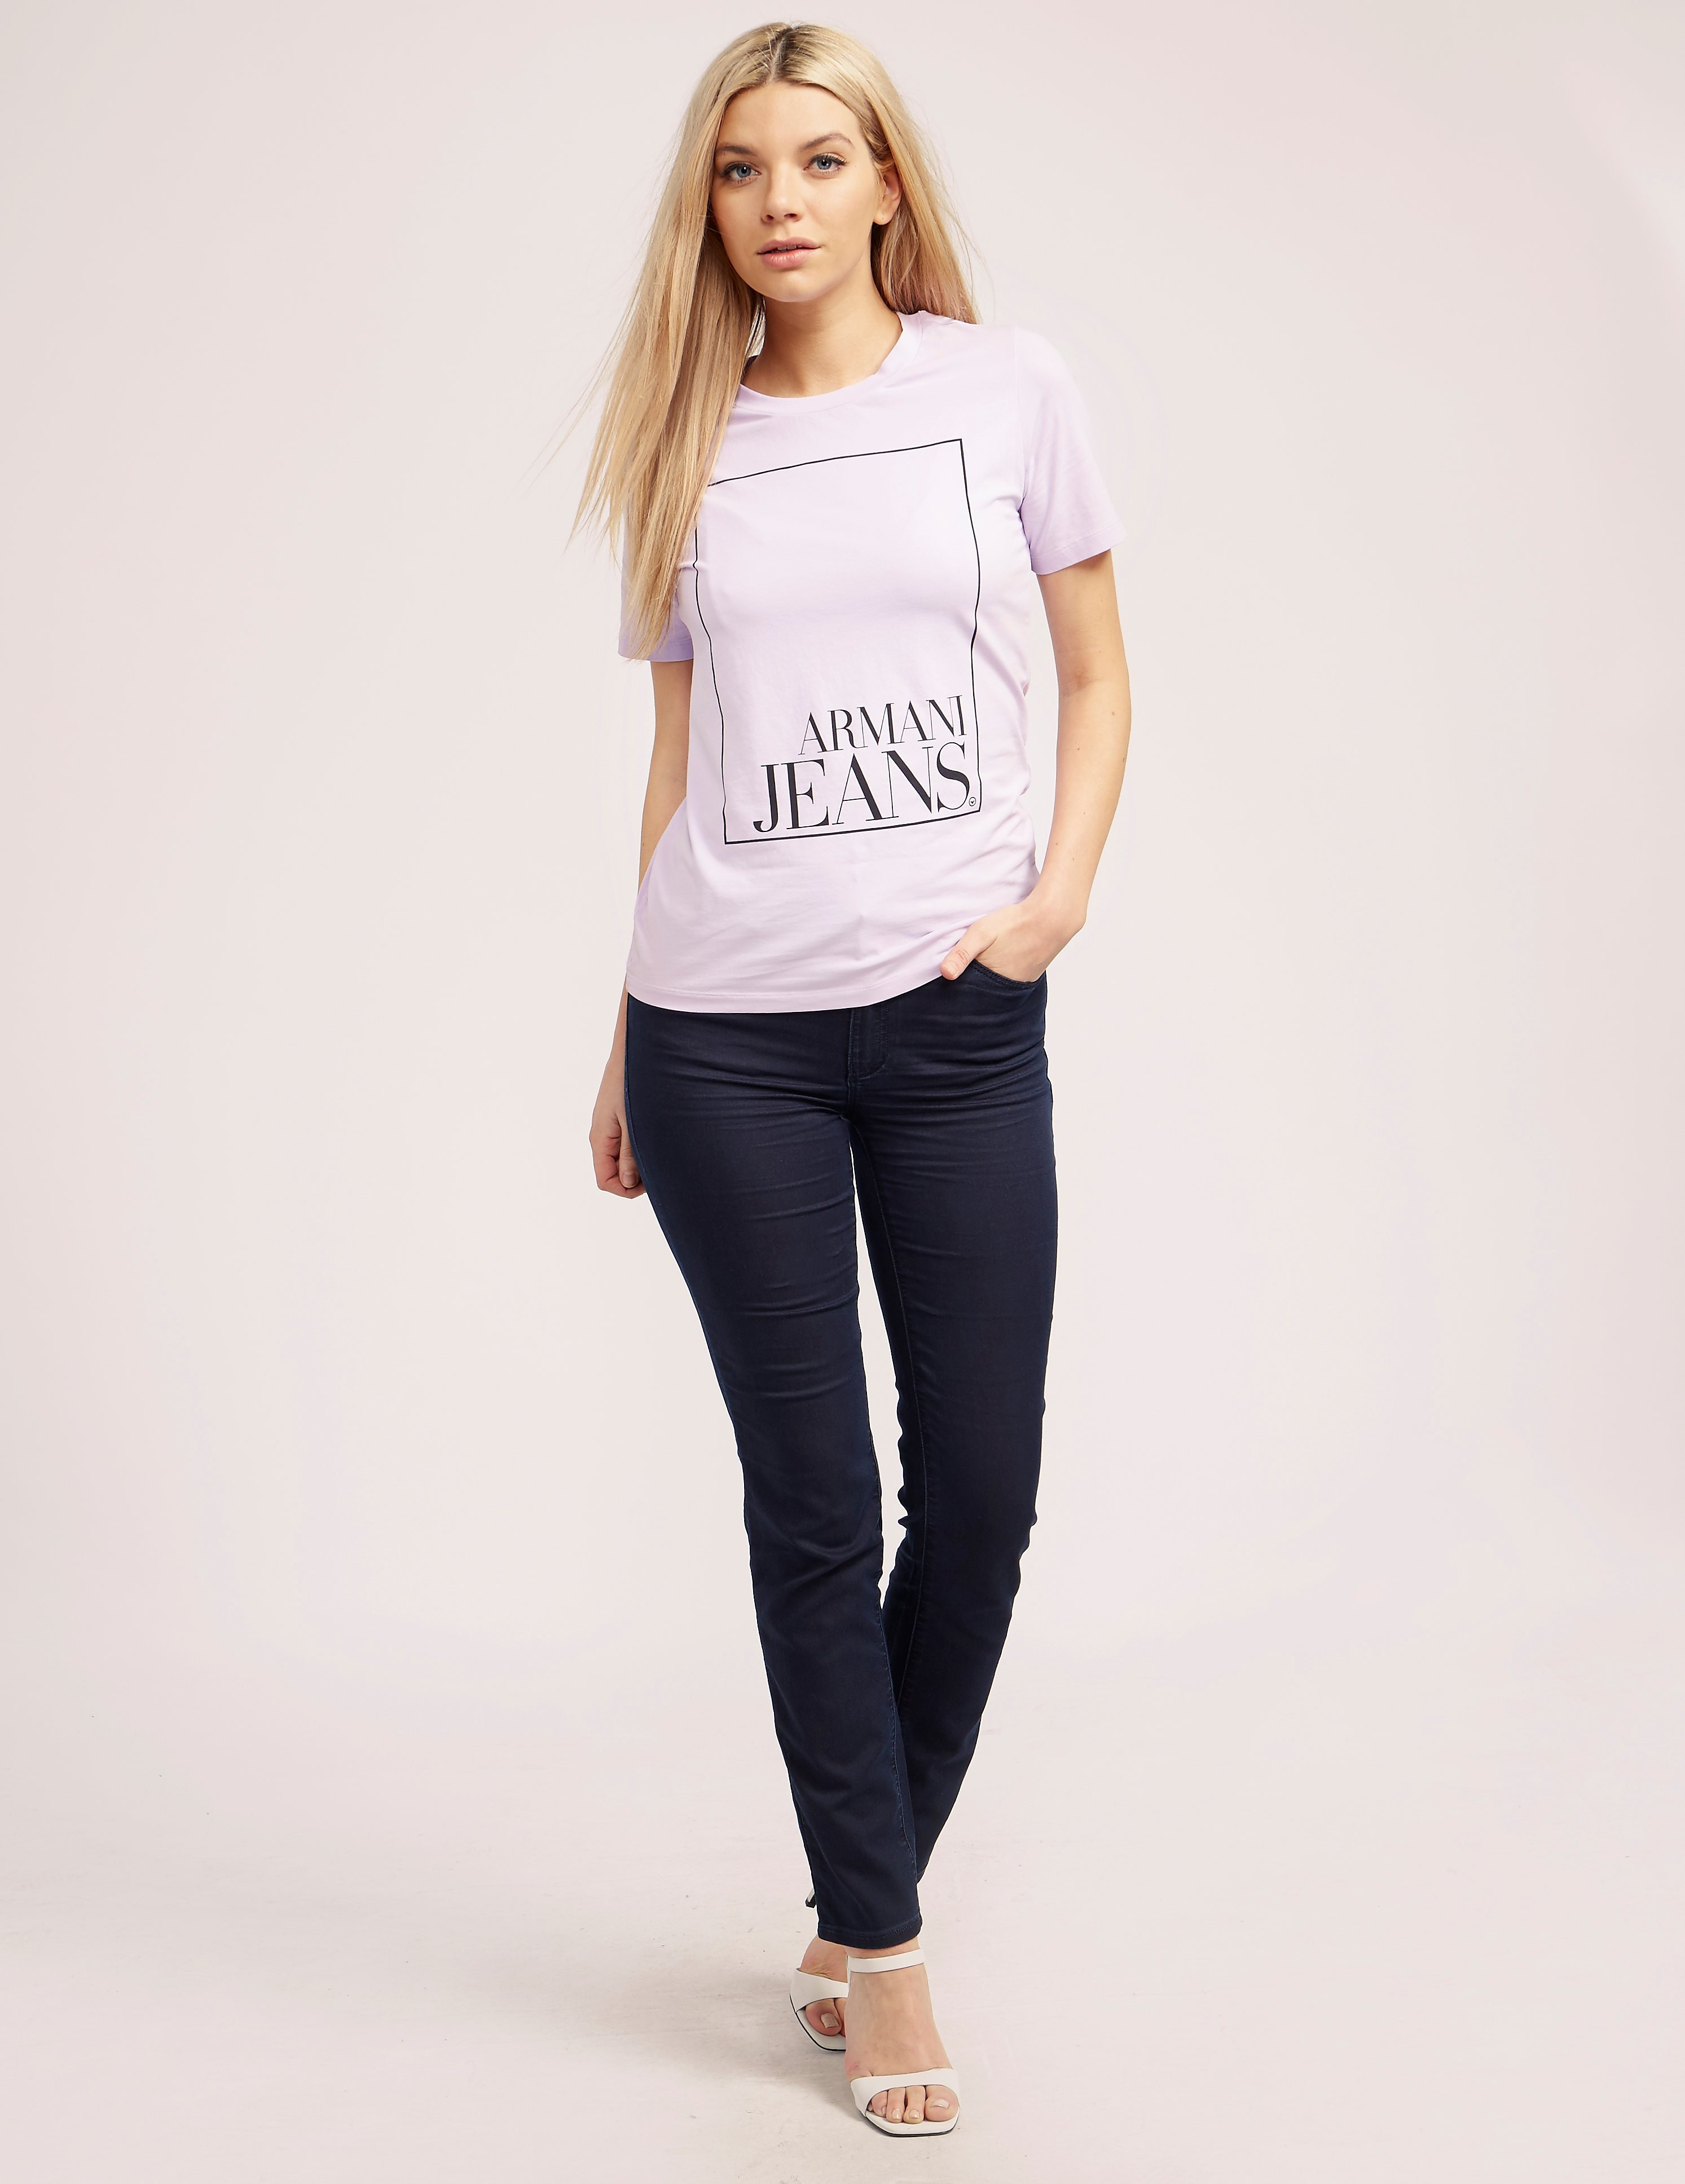 Armani Jeans Sqaure Logo Short Sleeve T-Shirt